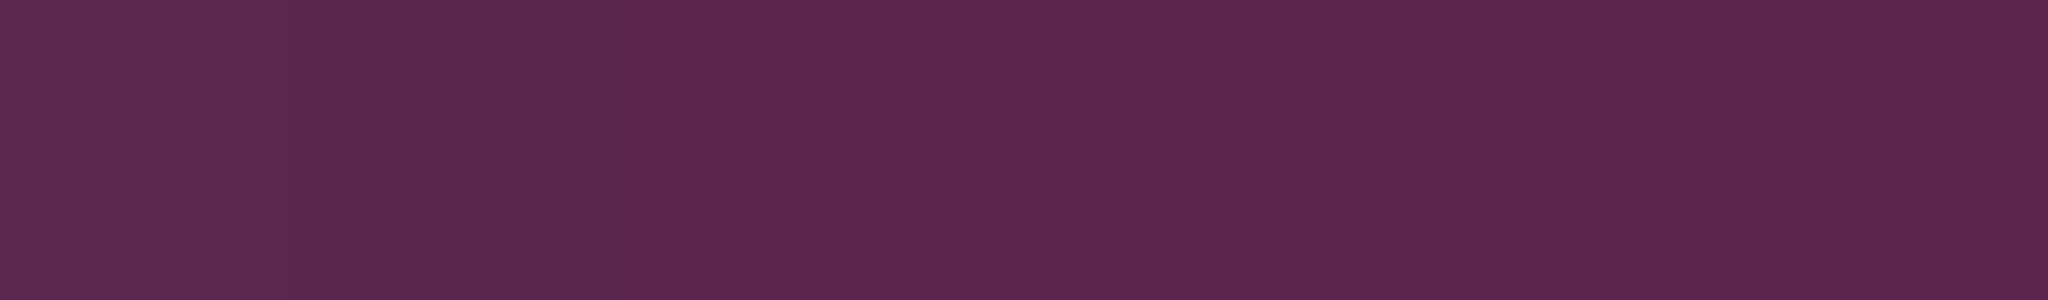 HU 15622 ABS hrana fialová hladká lesk 90°